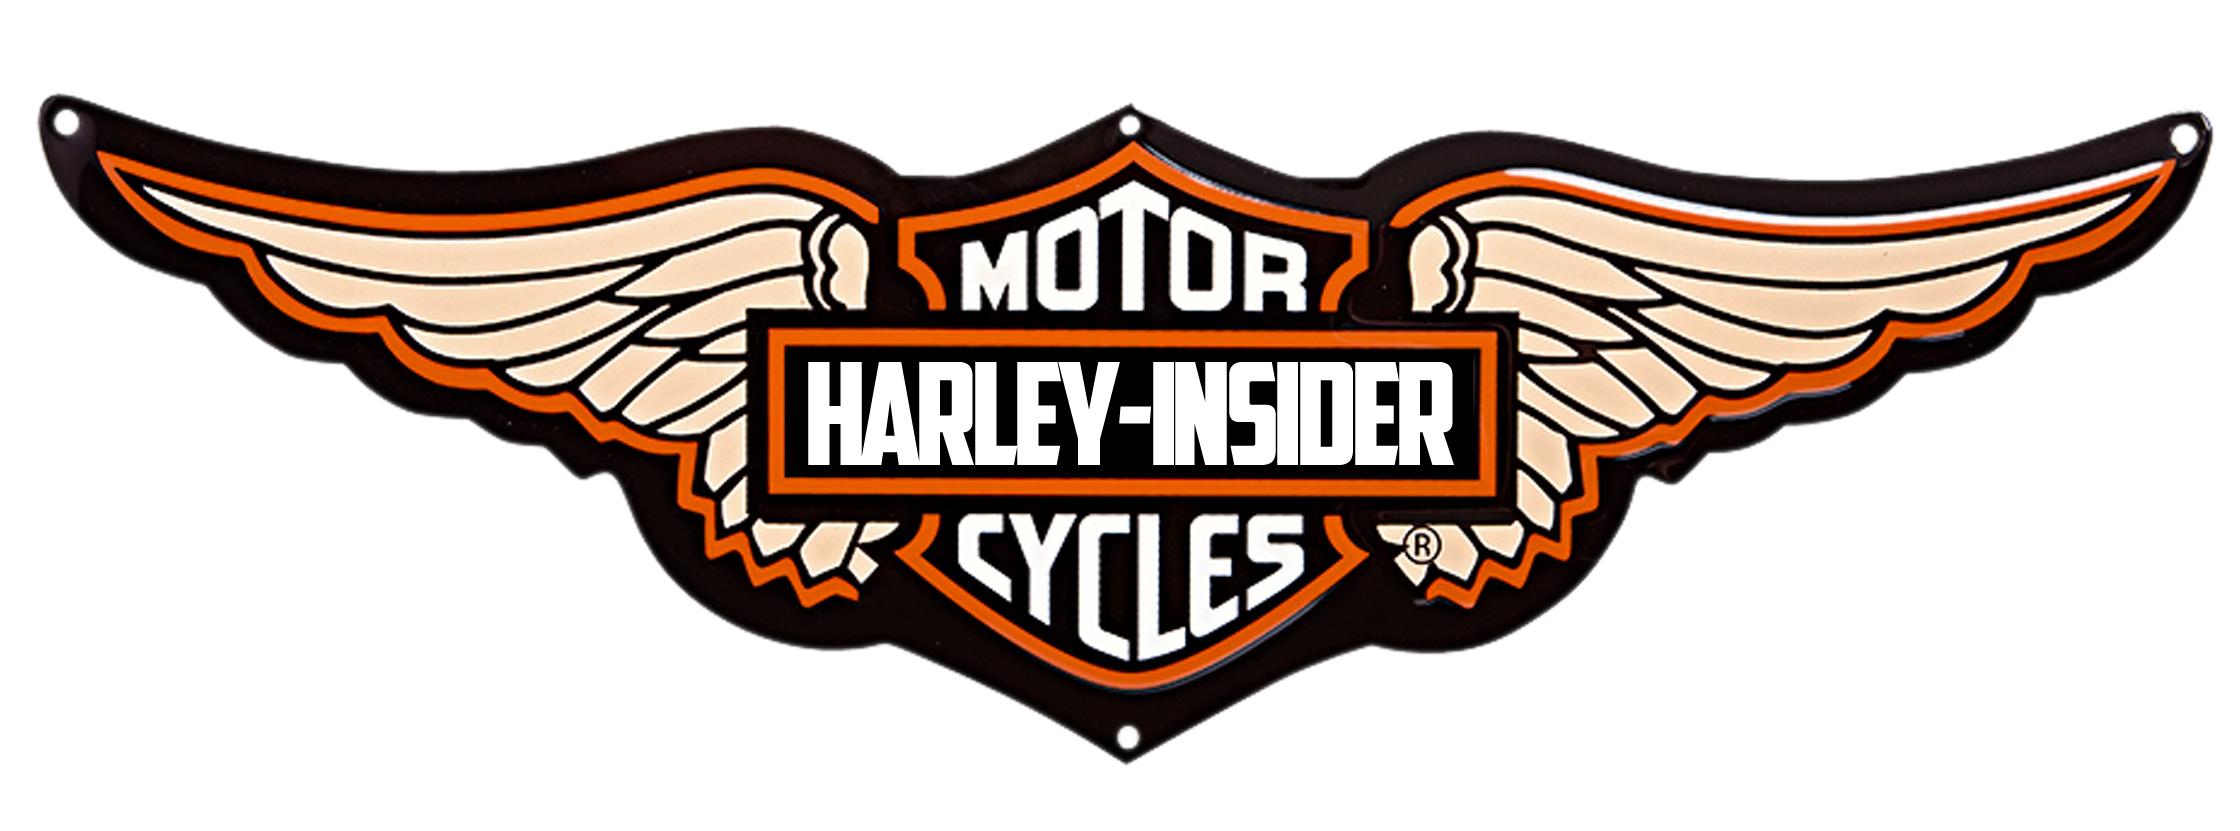 Harley davidson logo download. Clipart flames motorcycle